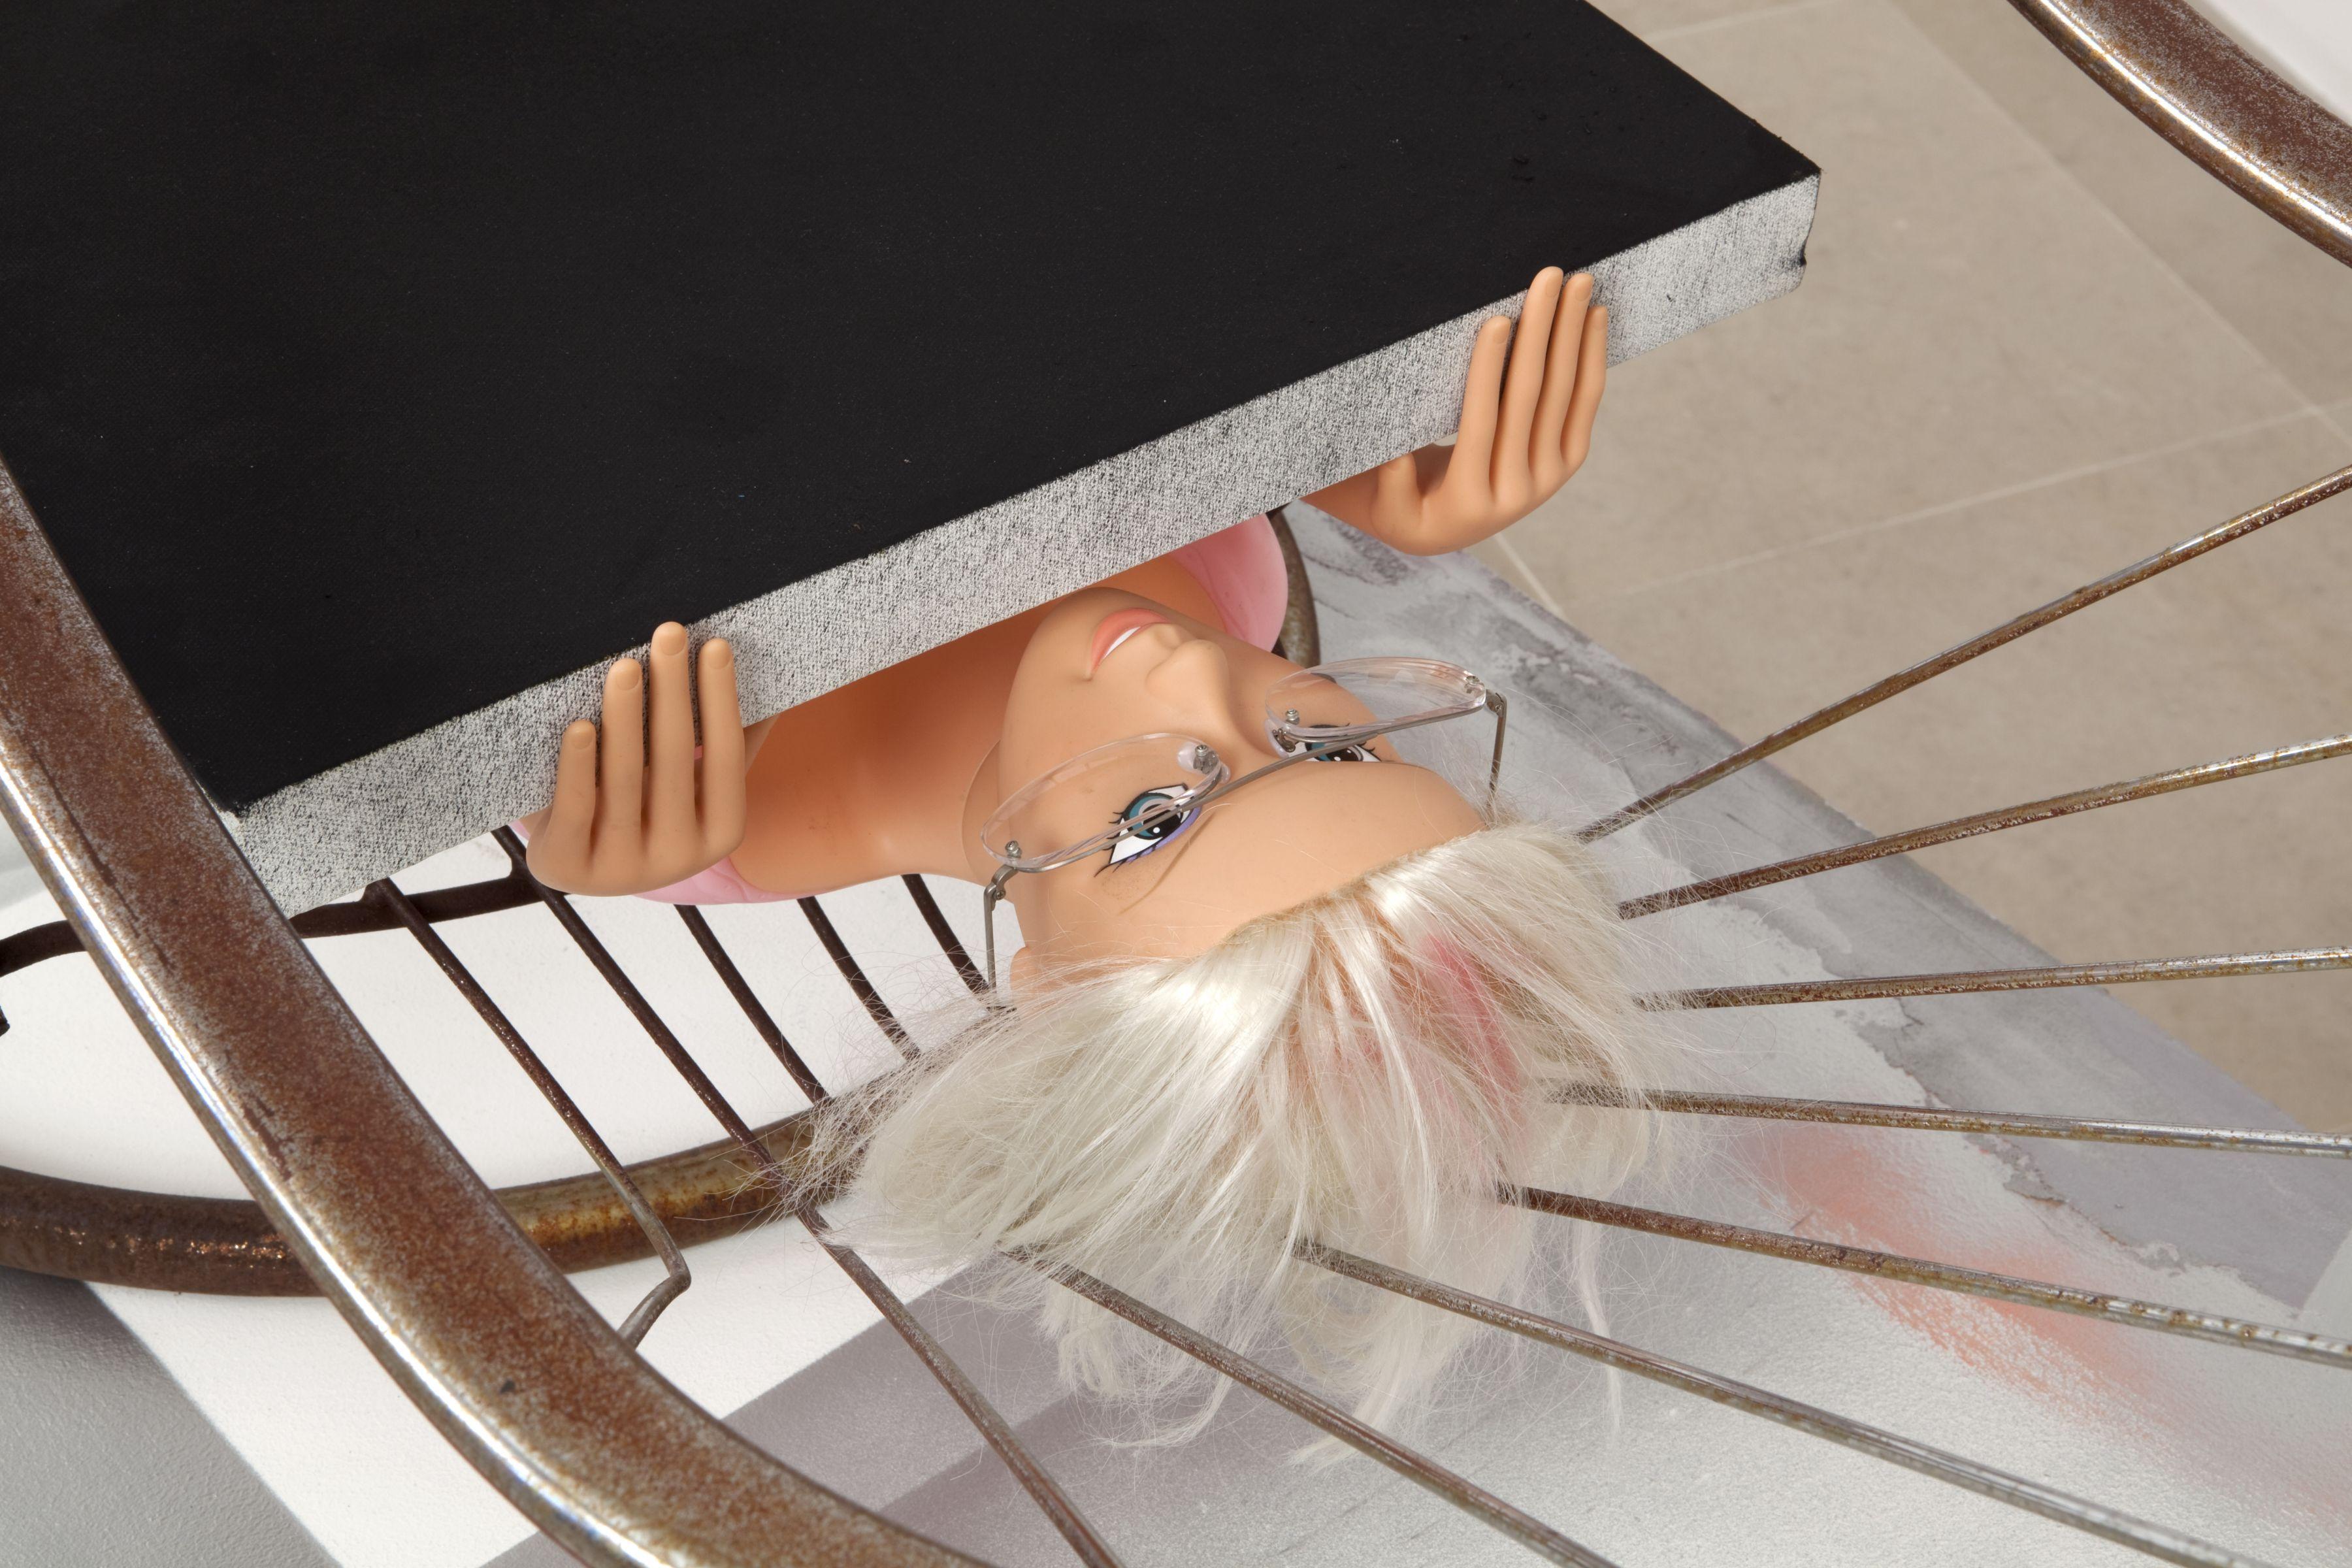 Rachel Harrison The Spoonbender, 2011 Wood, polystyrene, cement, acrylic, felt, canvas, steel chair, plastic doll and eyeglasses 53 1/2 x 59 x 77 inches (135.9 x 149.9 x 195.6 cm)